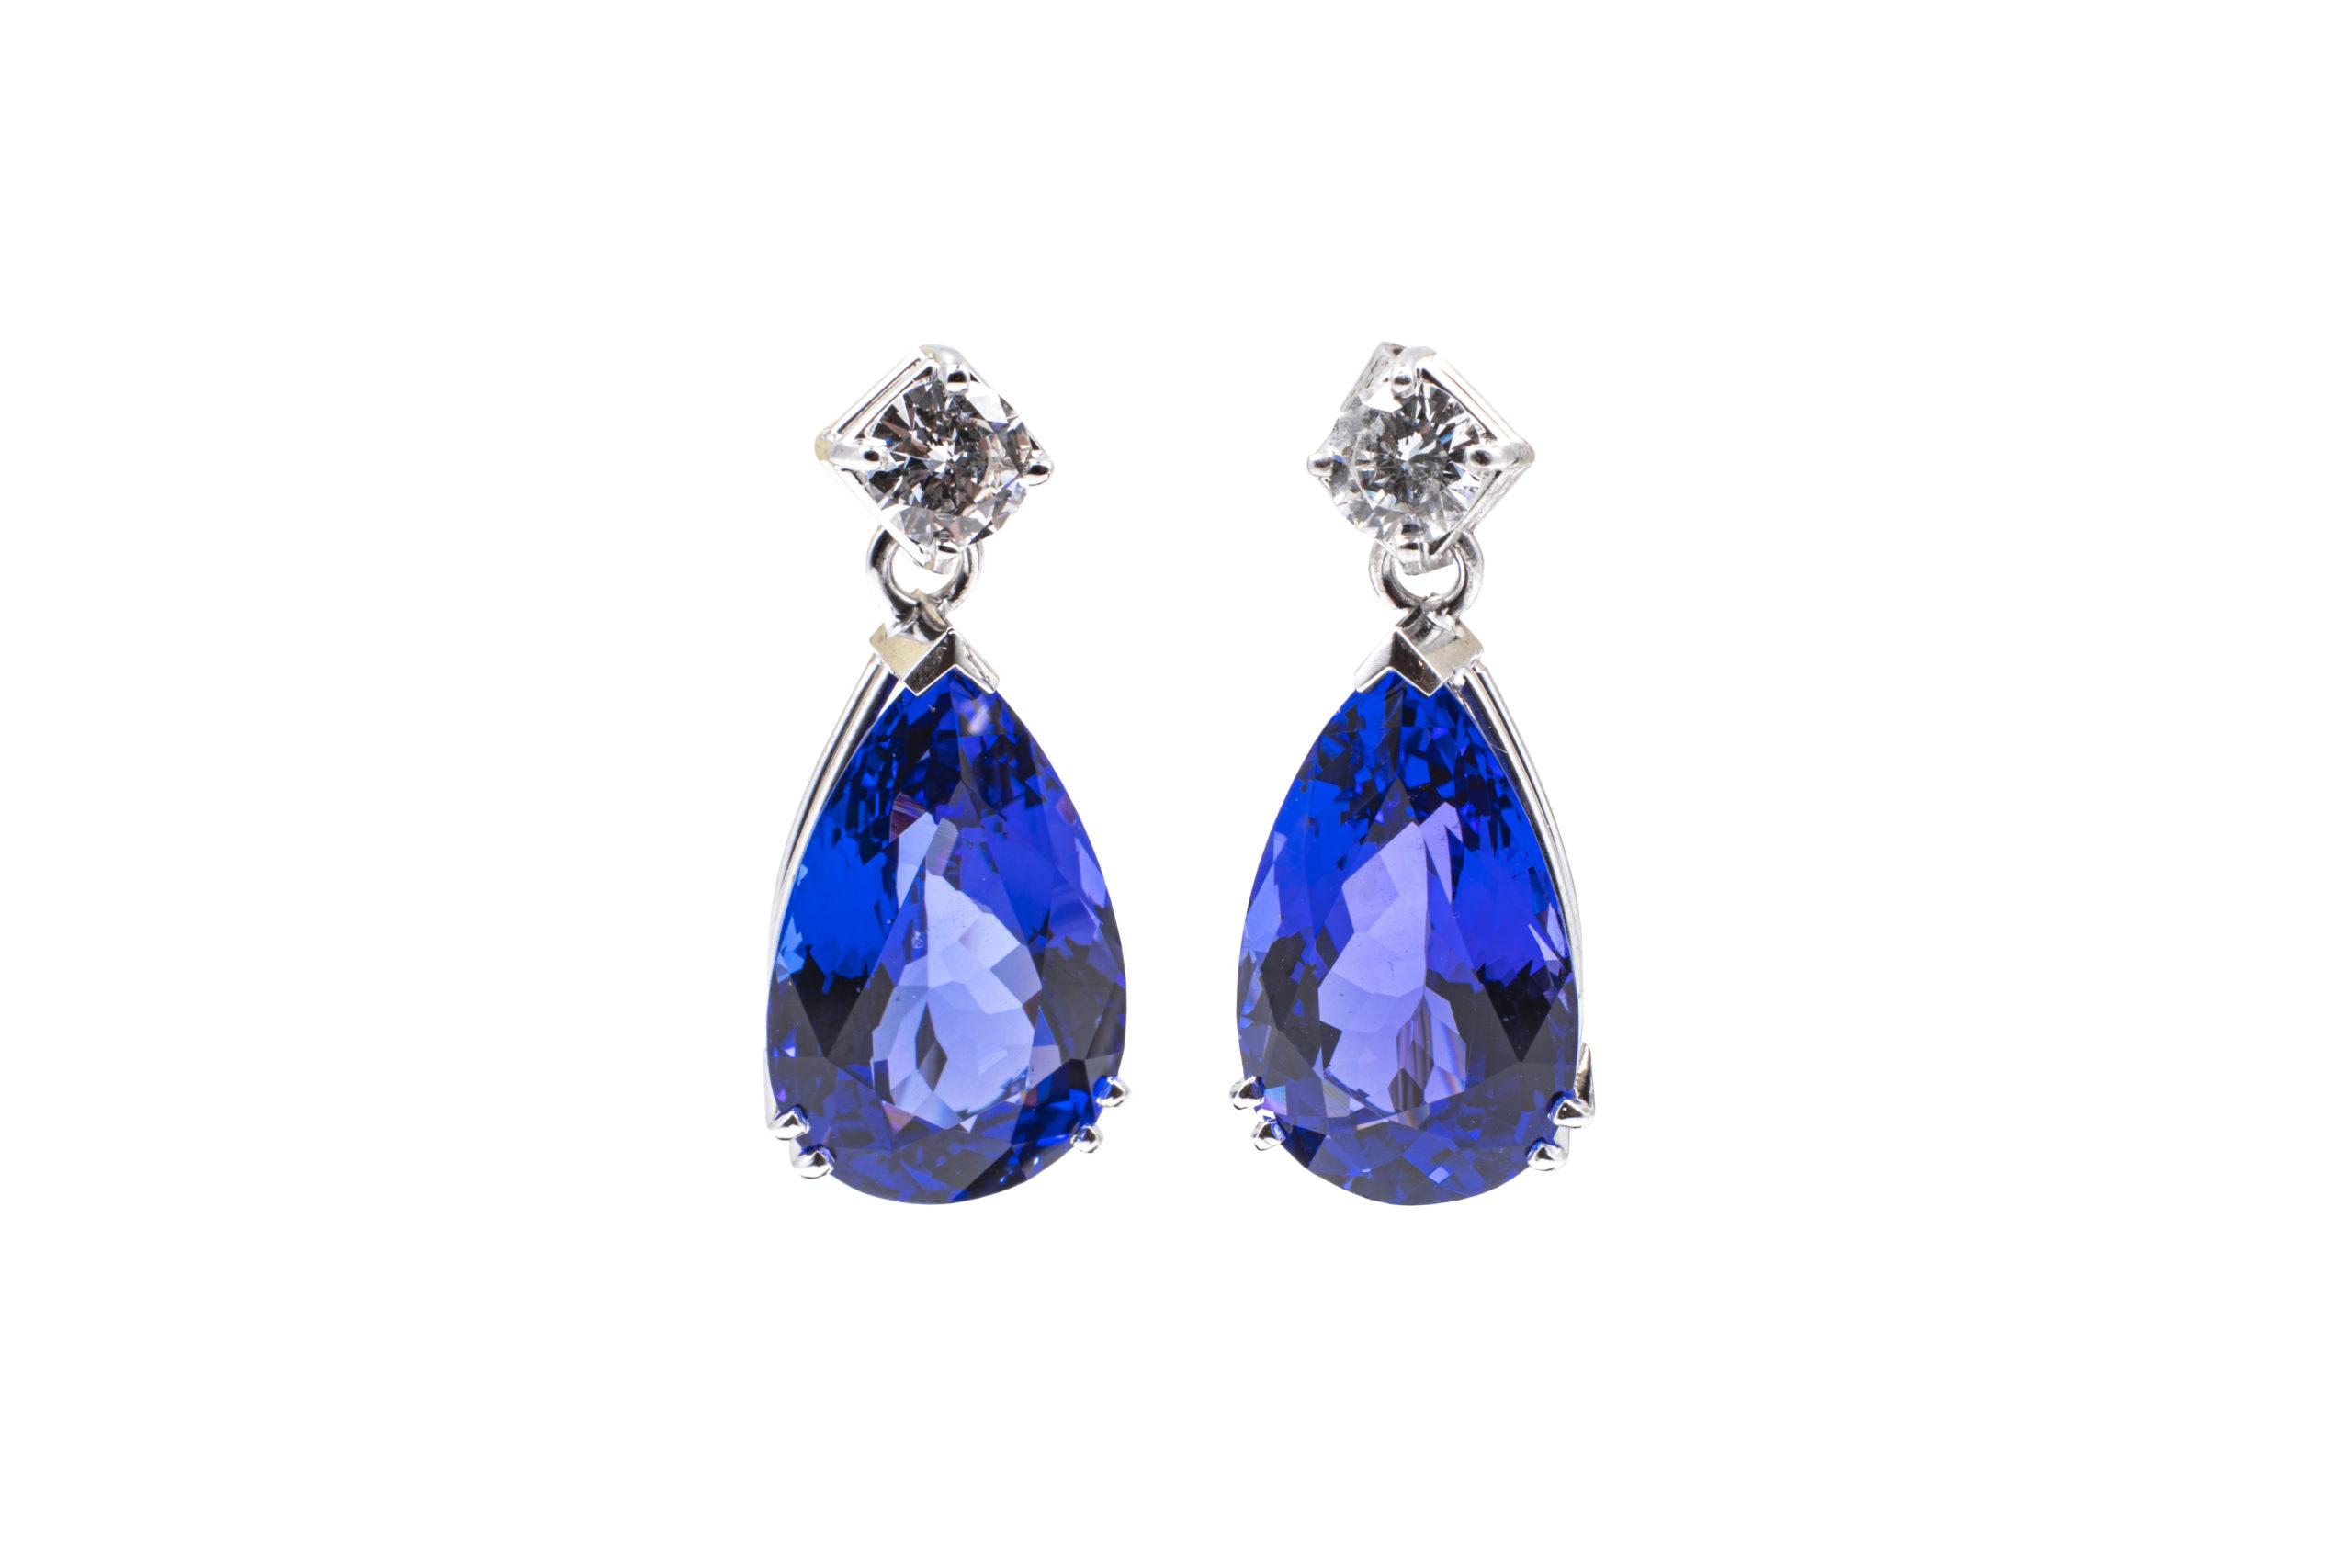 Blaue Saphir Ohrringe / The Natural Gem GmbH - Mineralogie facettenreich wie das Material